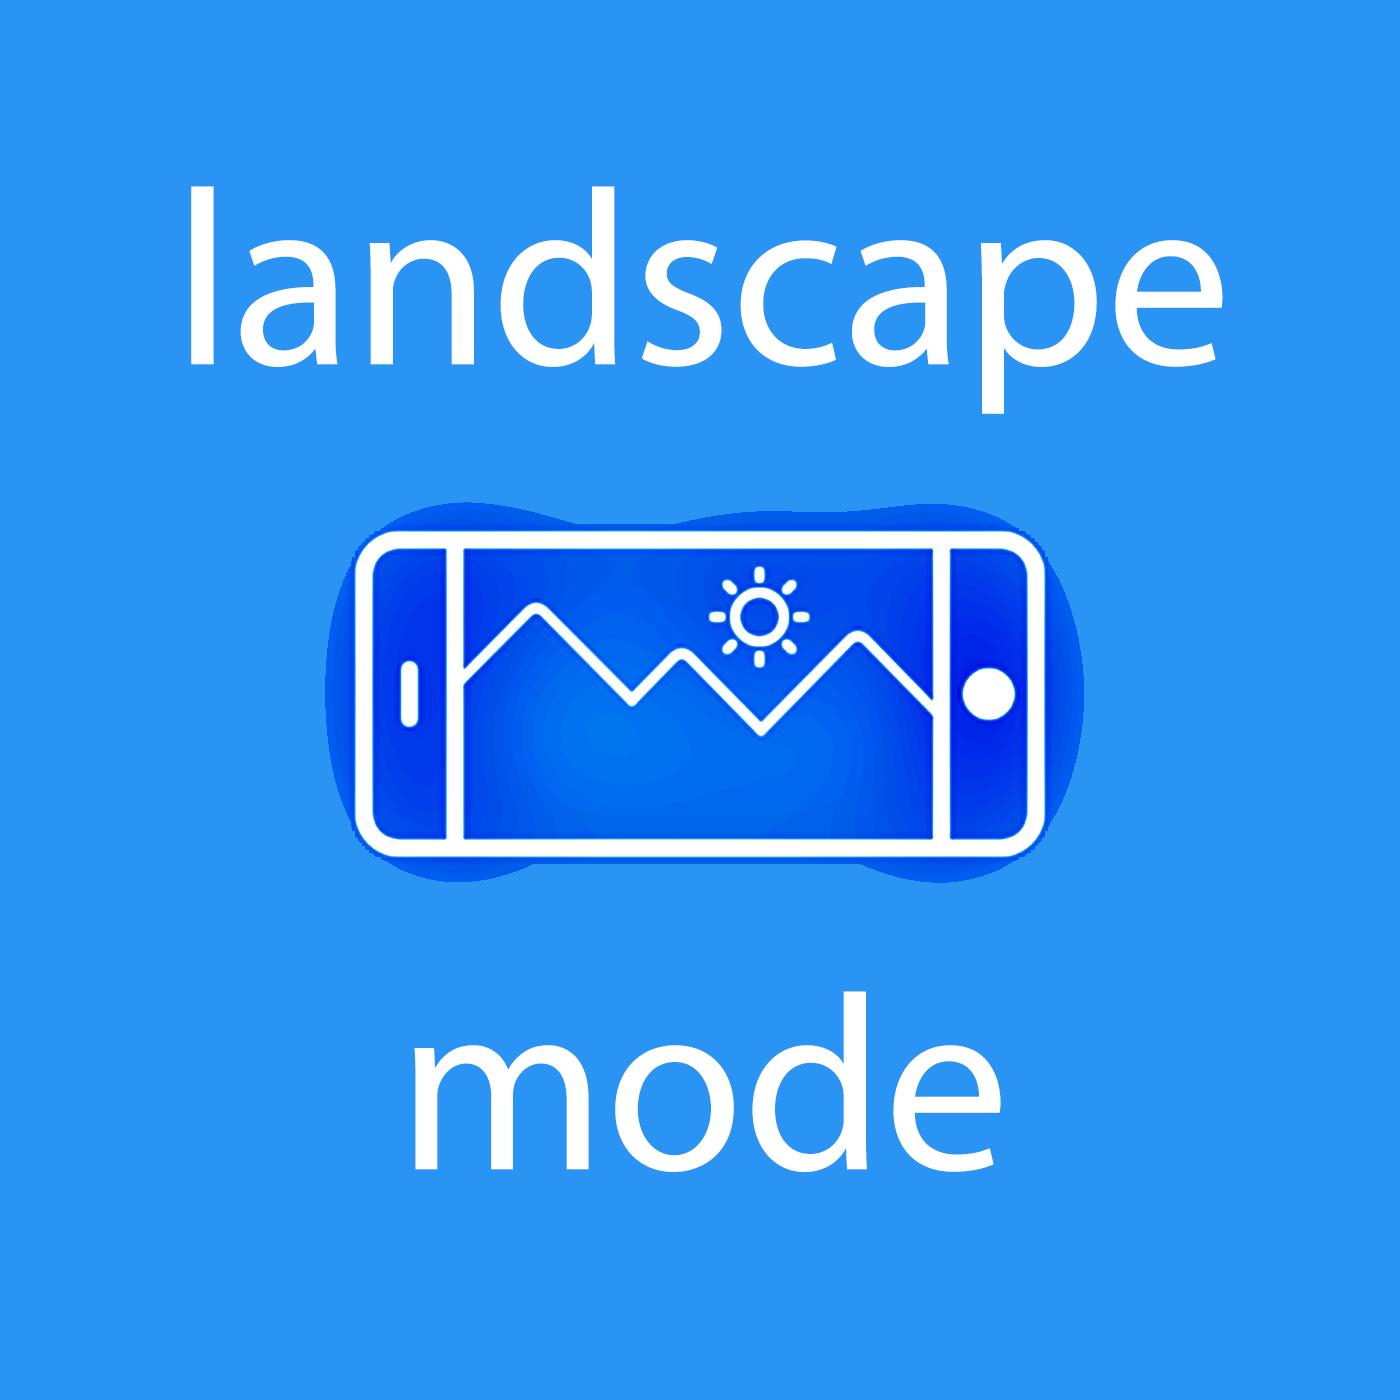 landscape mode